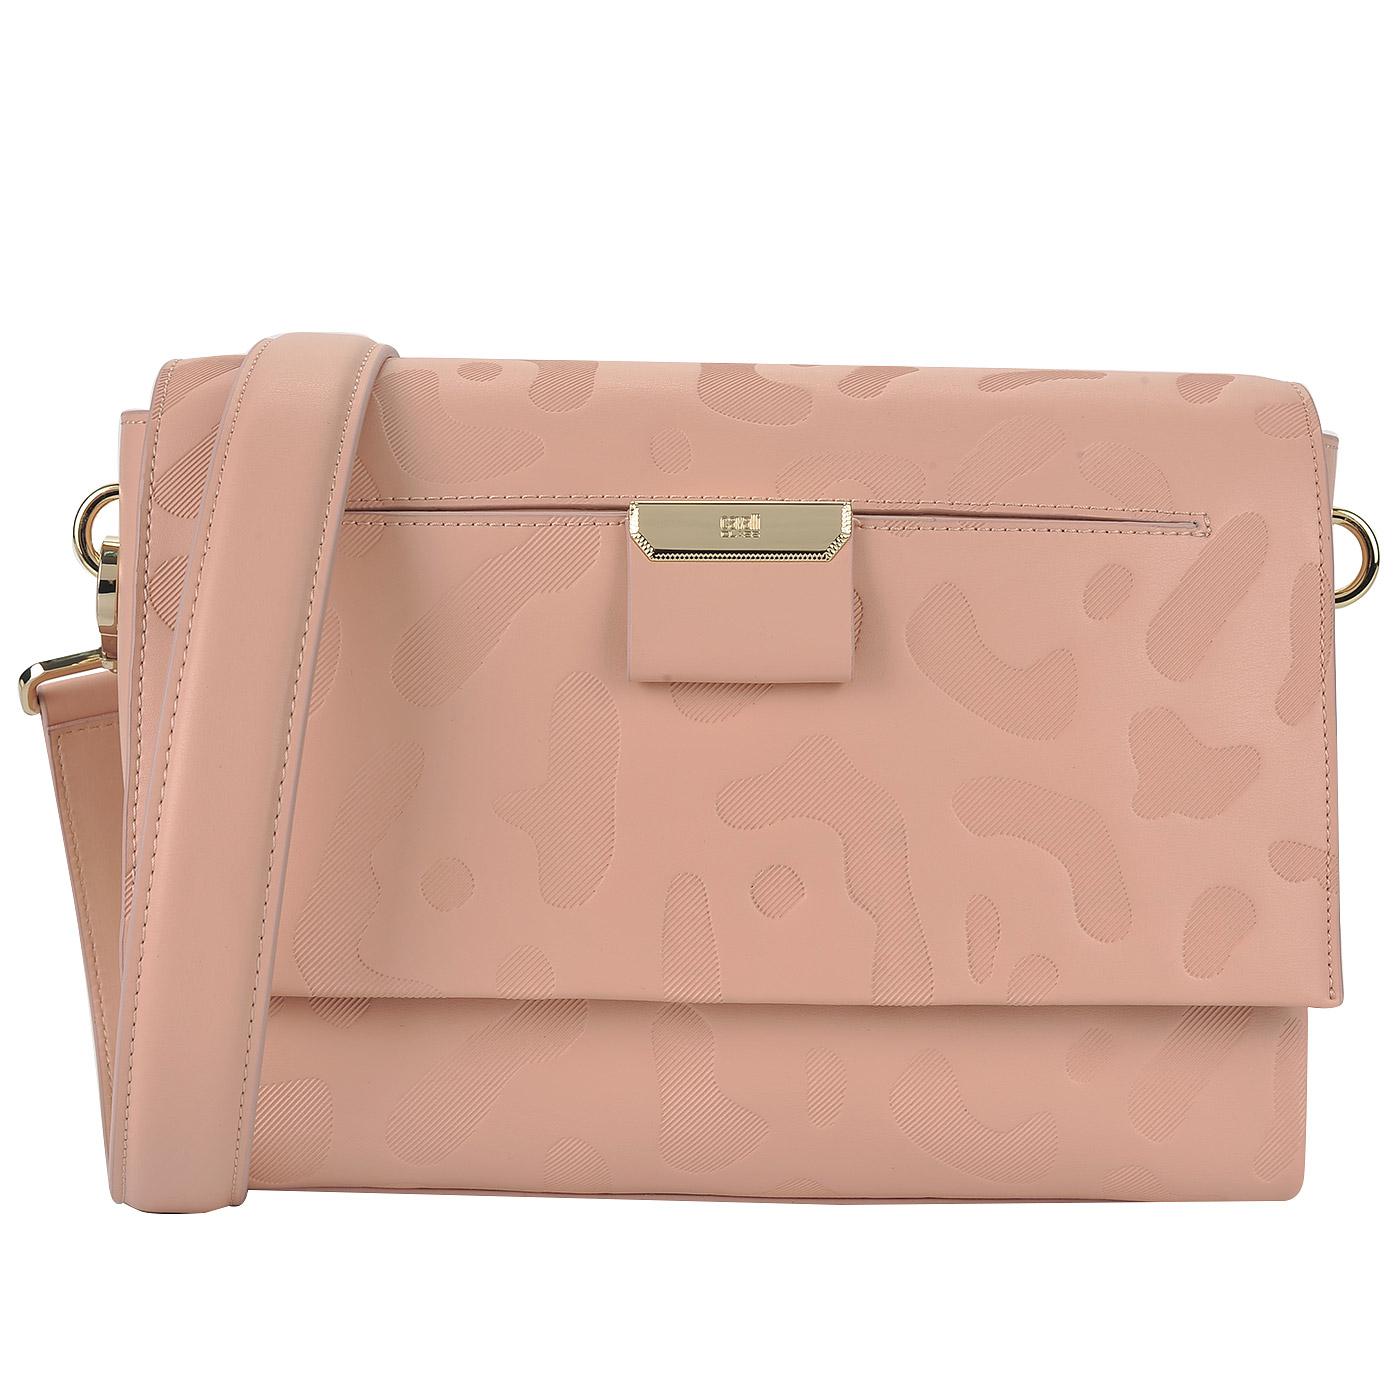 784547d26703 Женская кожаная сумка с двумя ремешками Cavalli Class Sofia ...